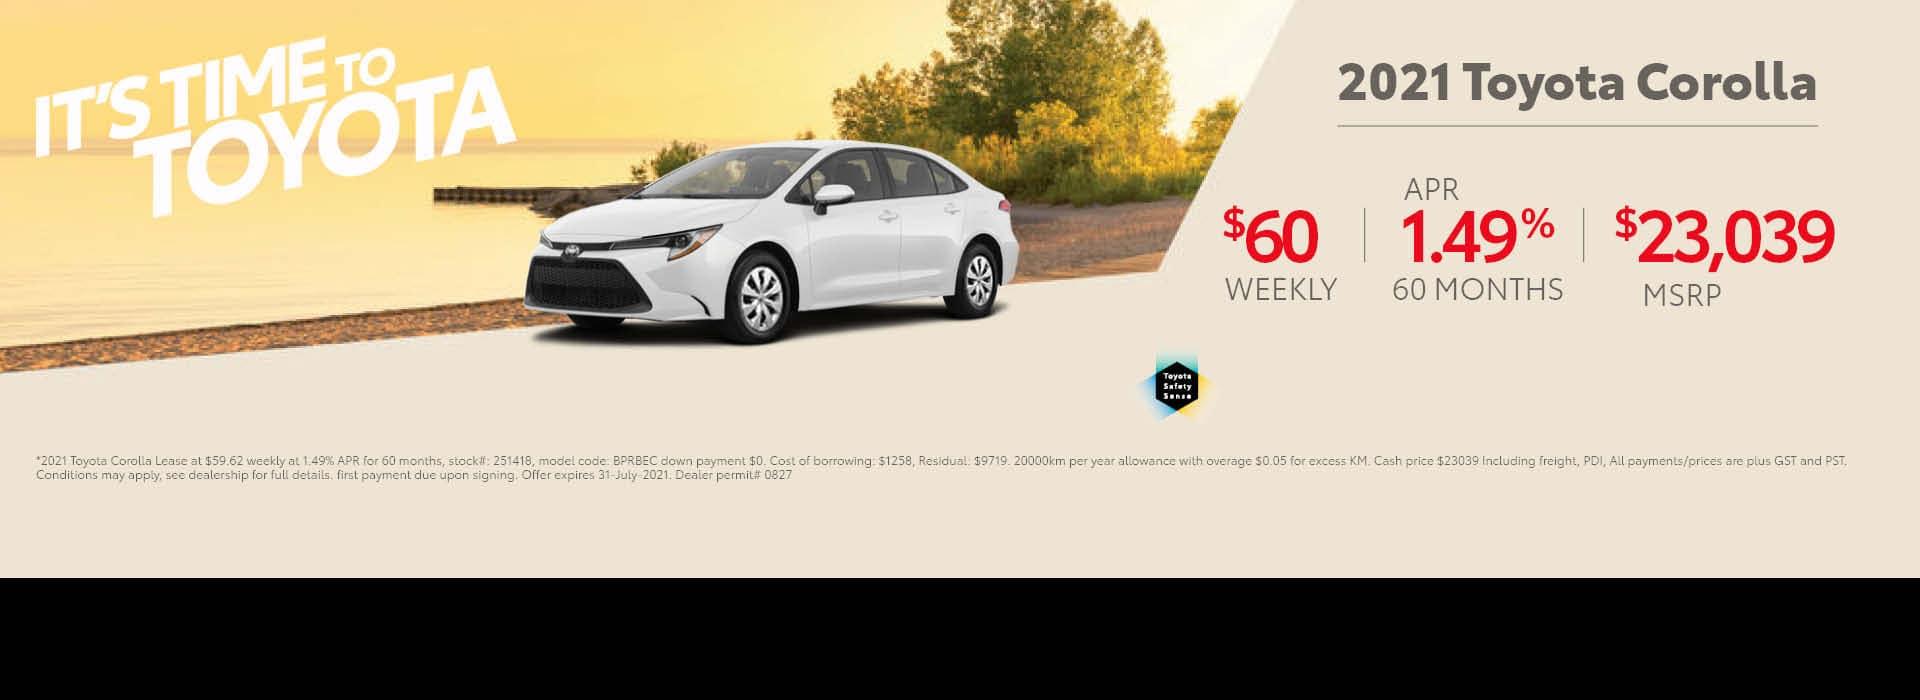 2021_Toyota_Corolla_Desktop_July2021_V1